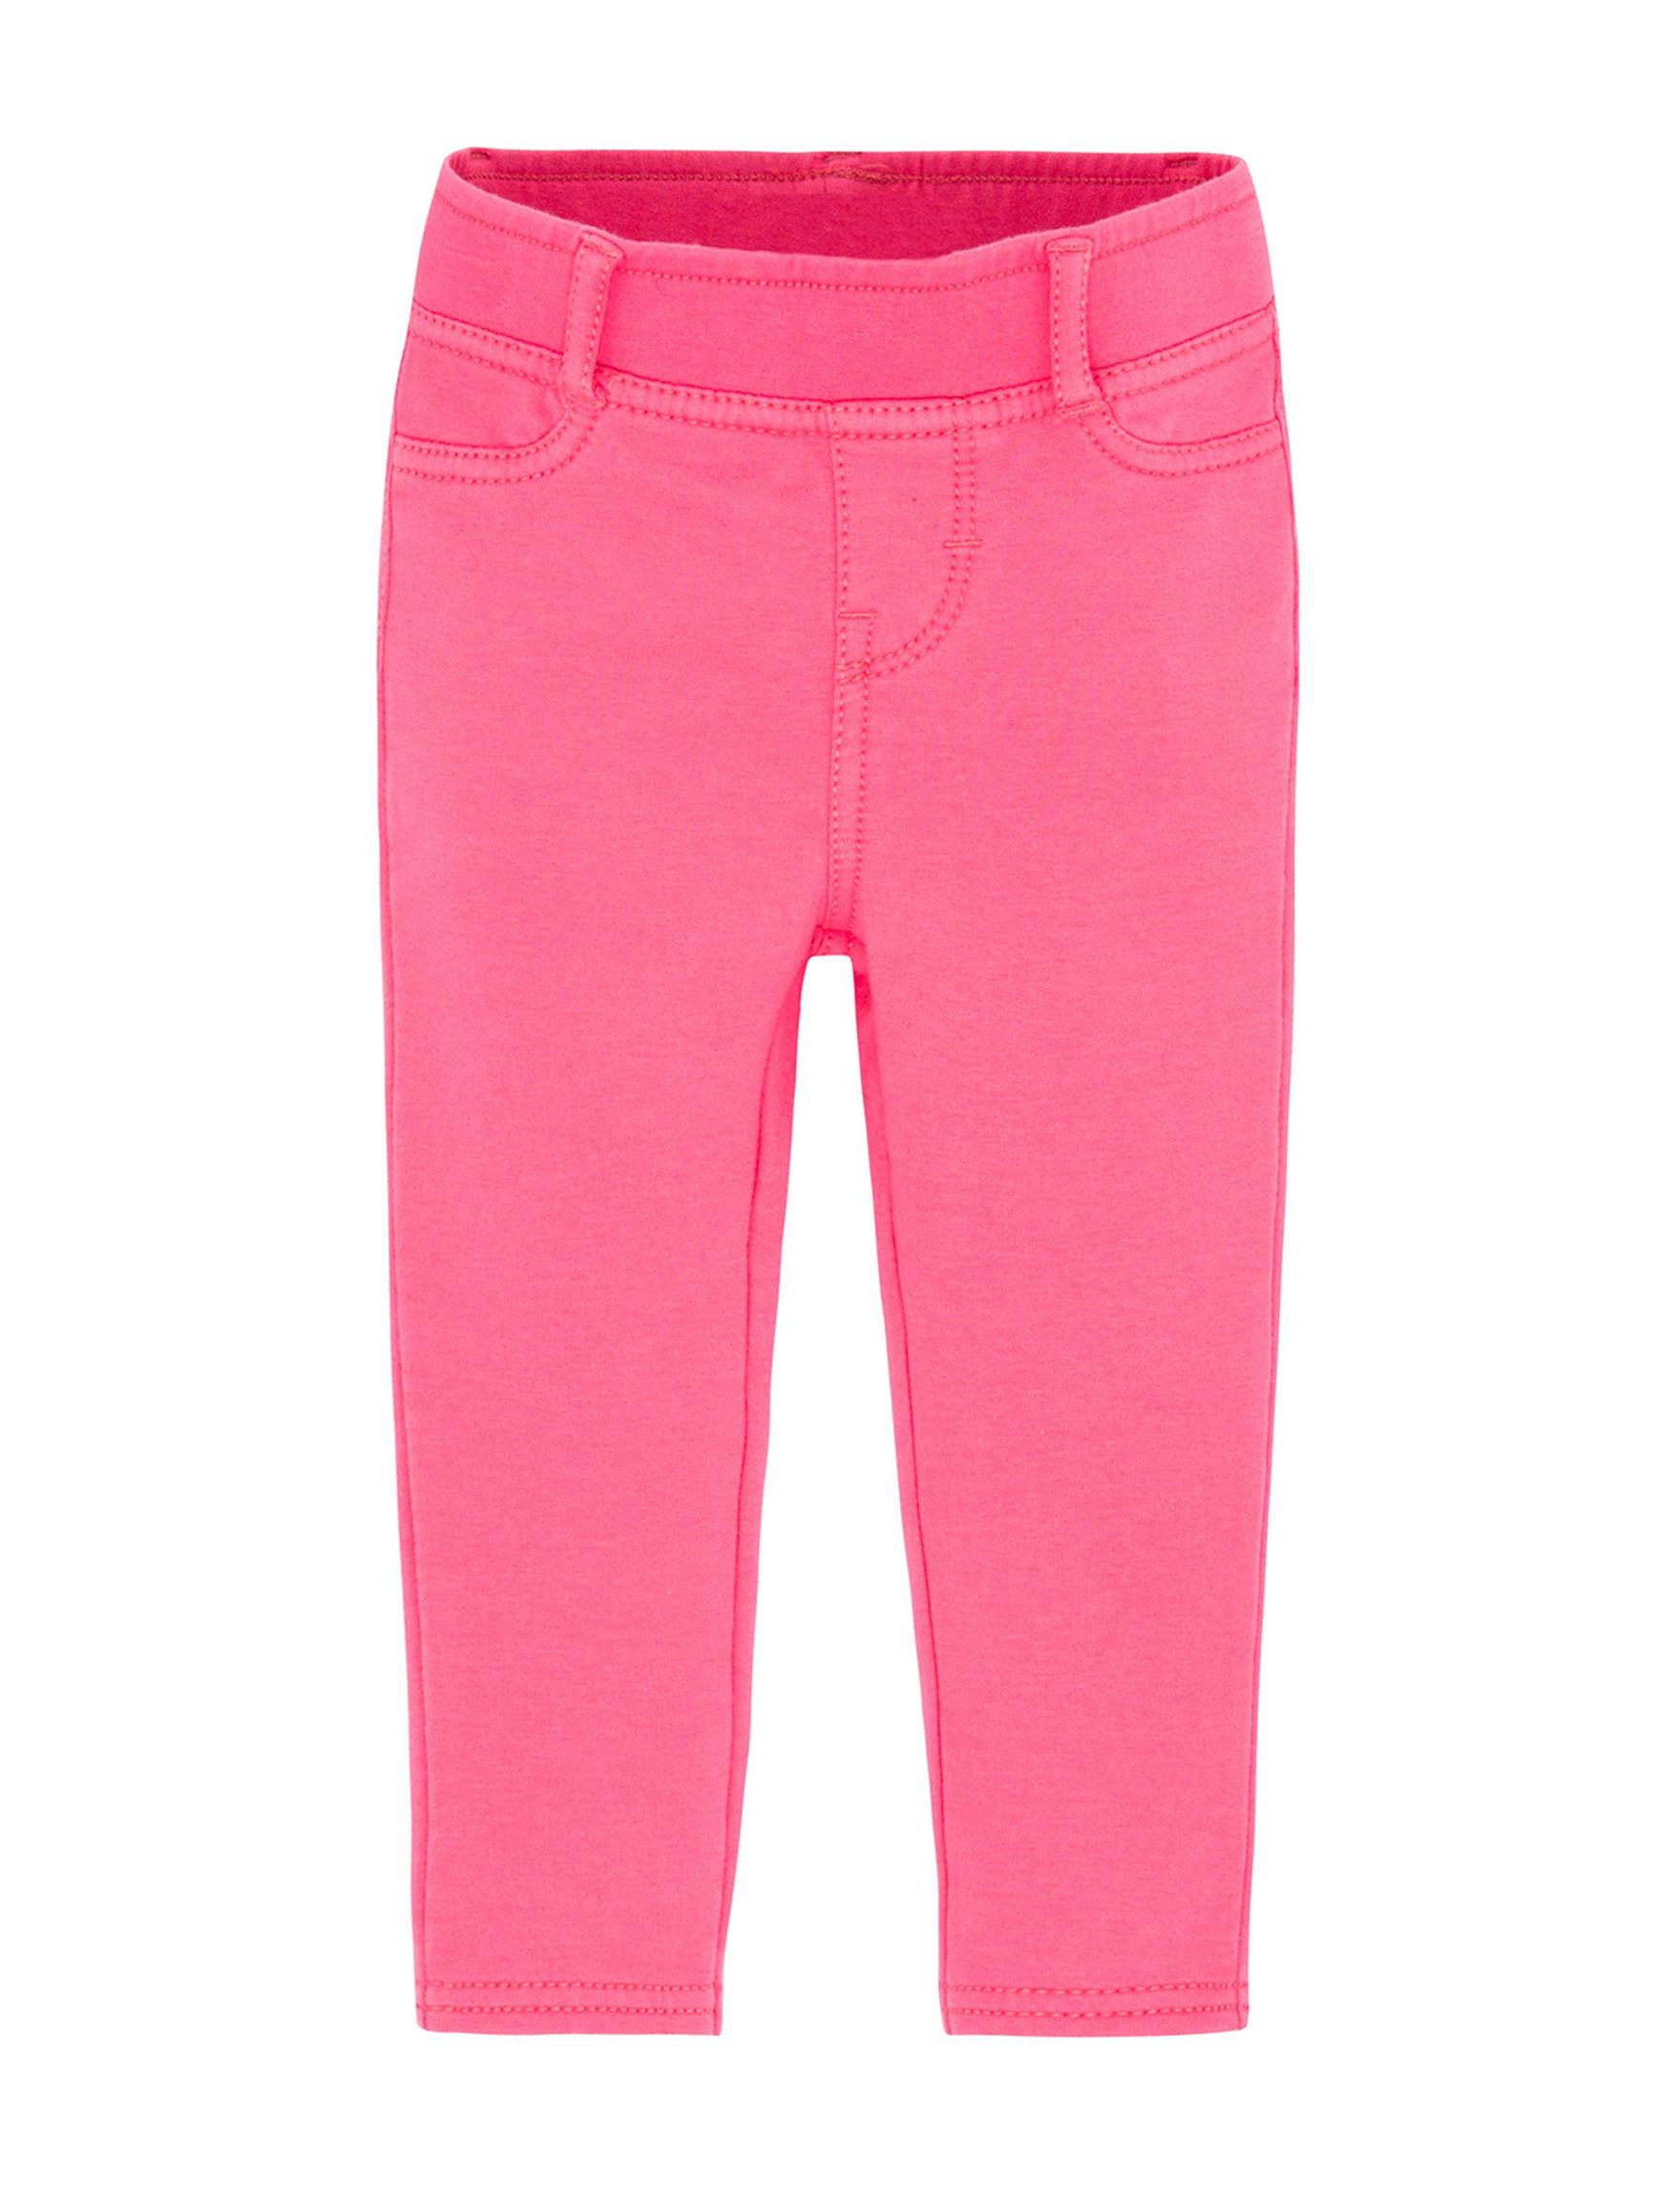 Levi's Medium Pink